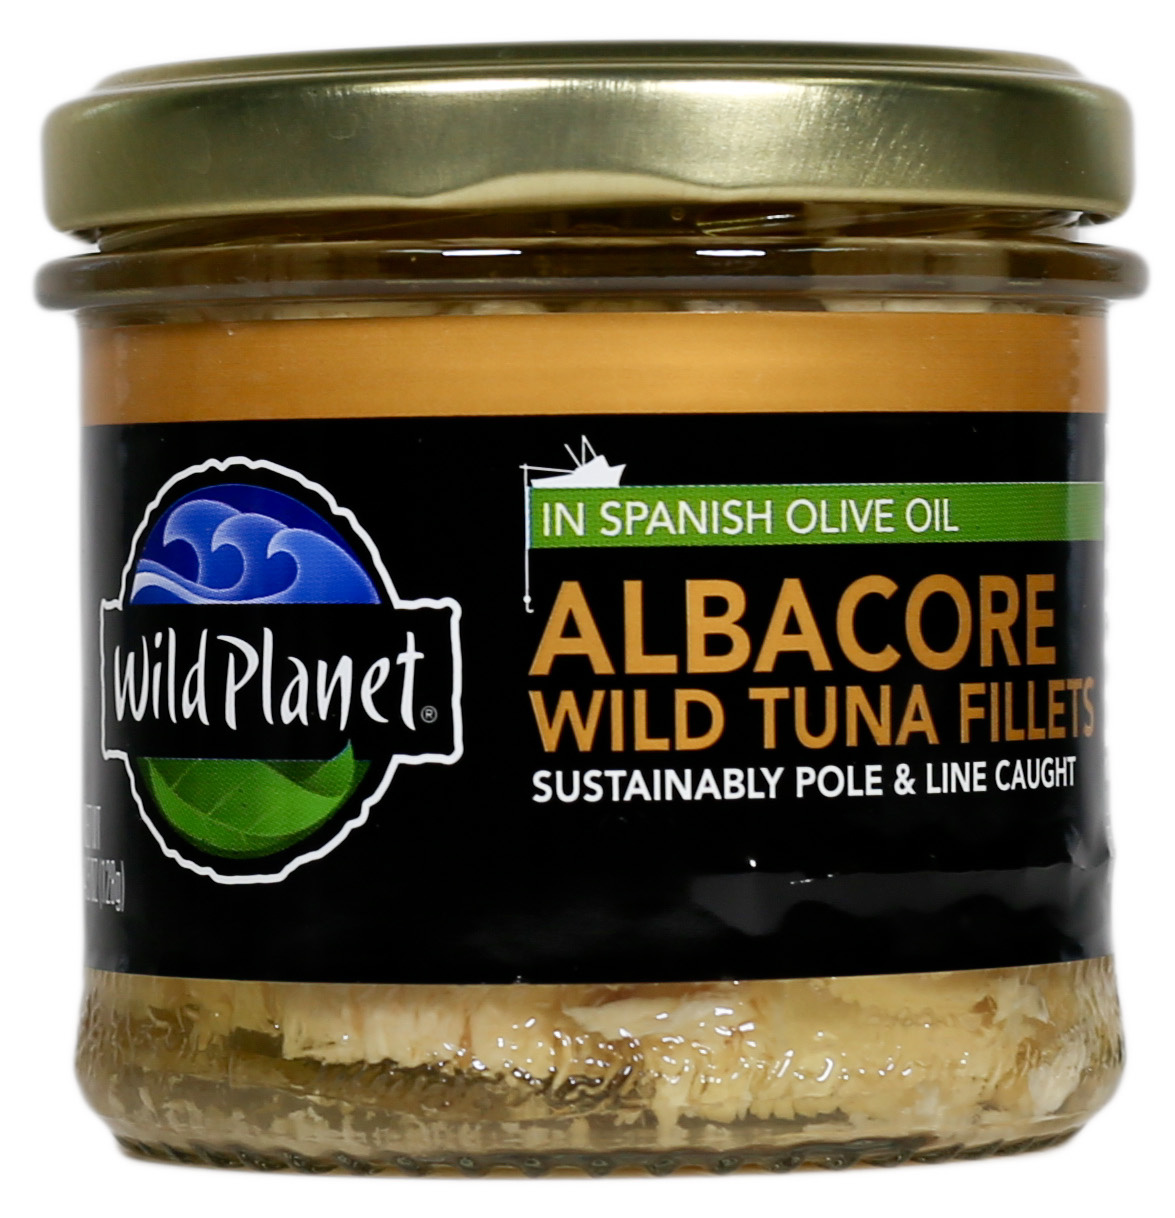 Wild Planet Jarred Wild Albacore Tuna Fillets, 100% Poll & Troll Caught, in Spanish olive Oil, 4.5 Oz